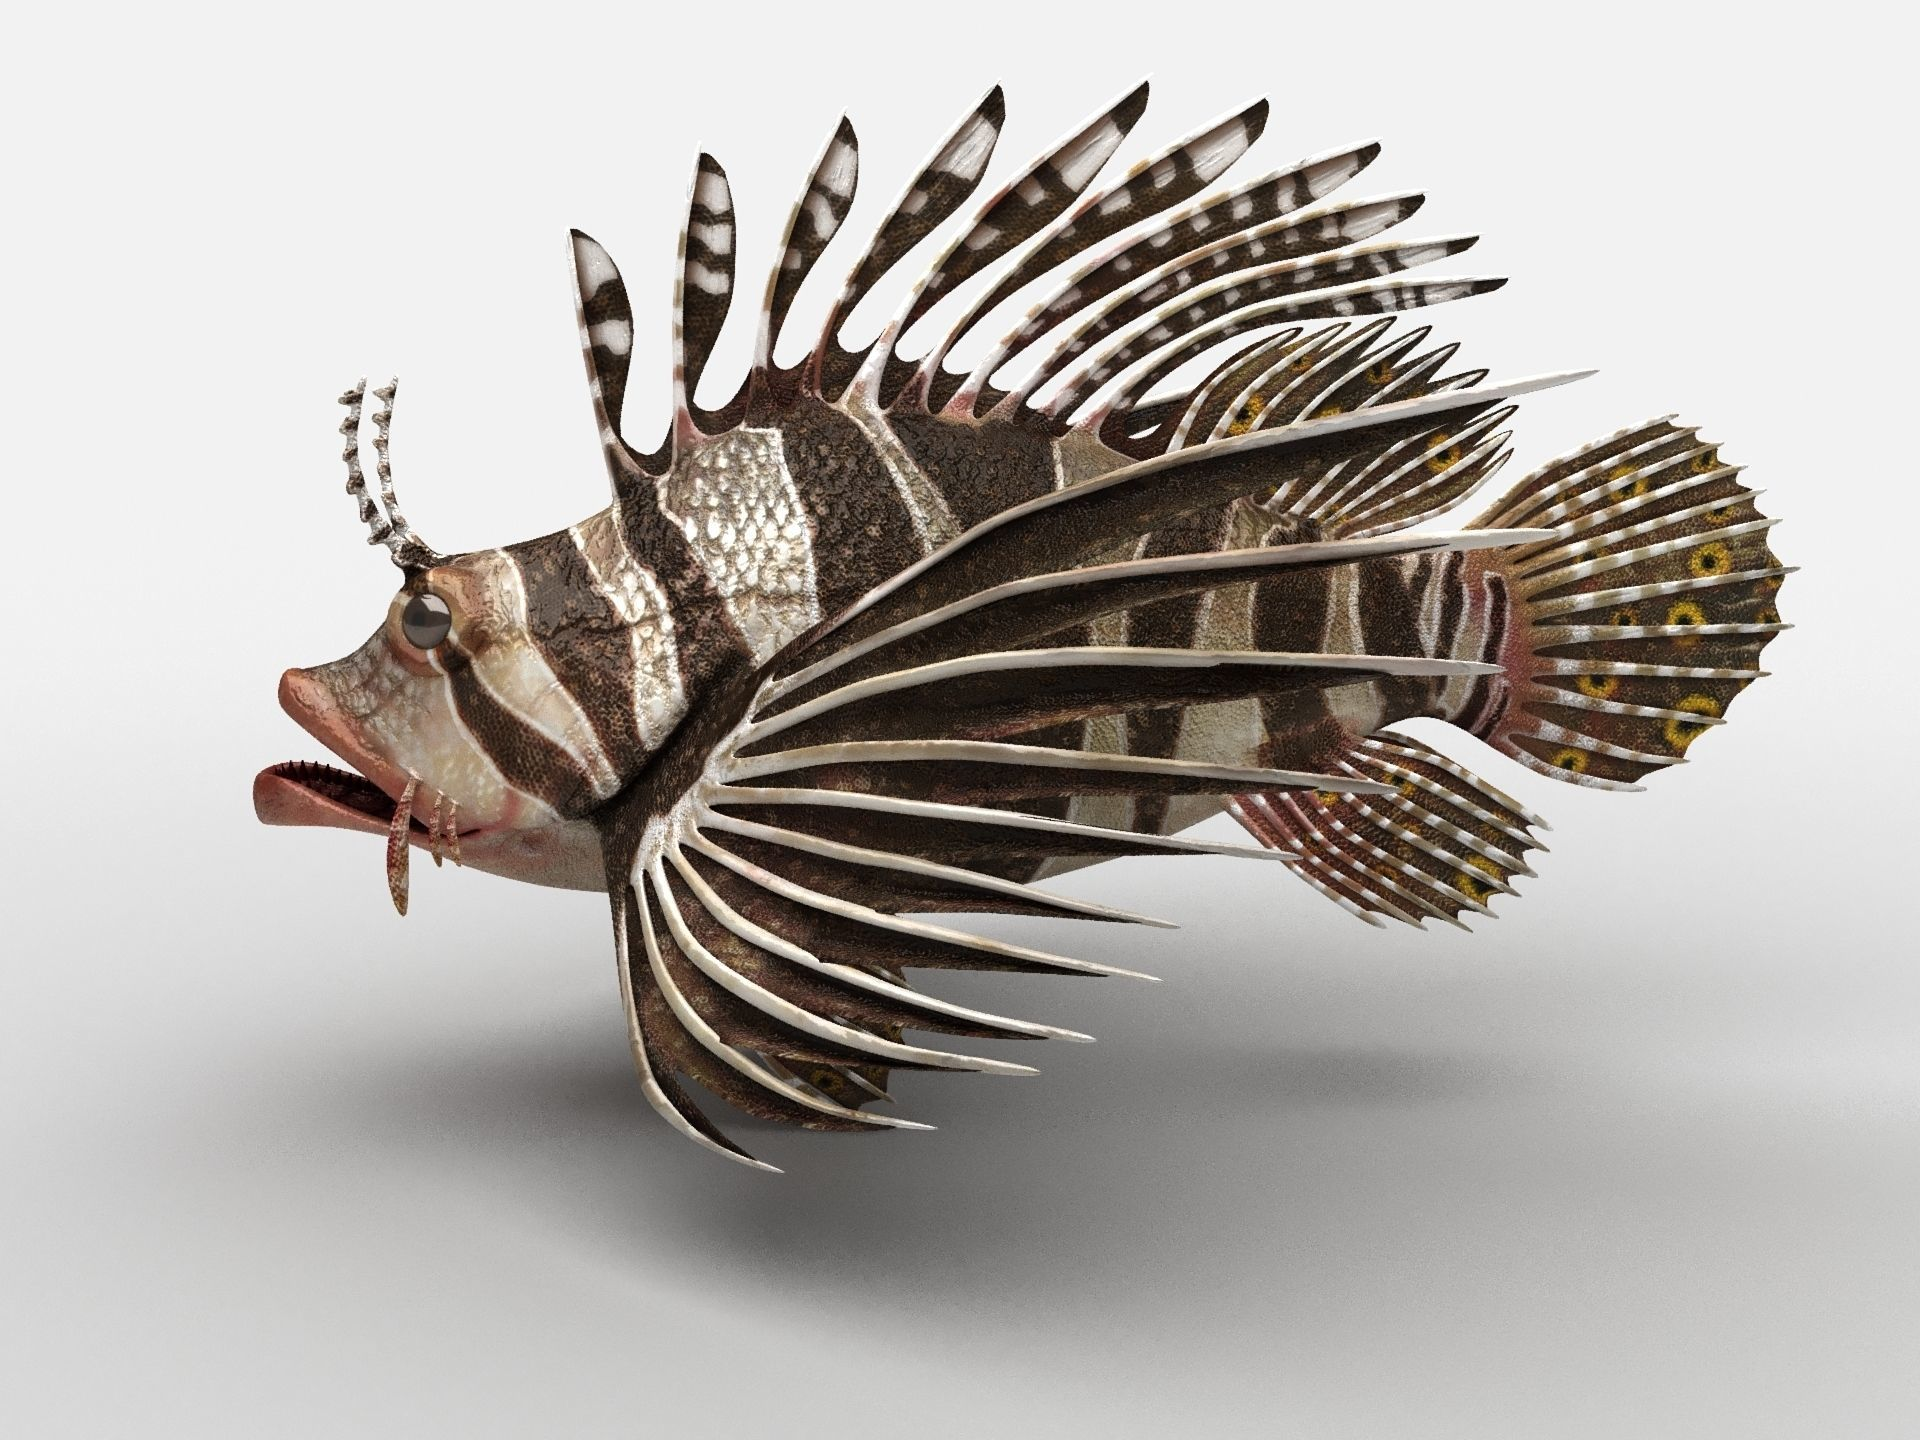 Scorpion fish Scorpen-1